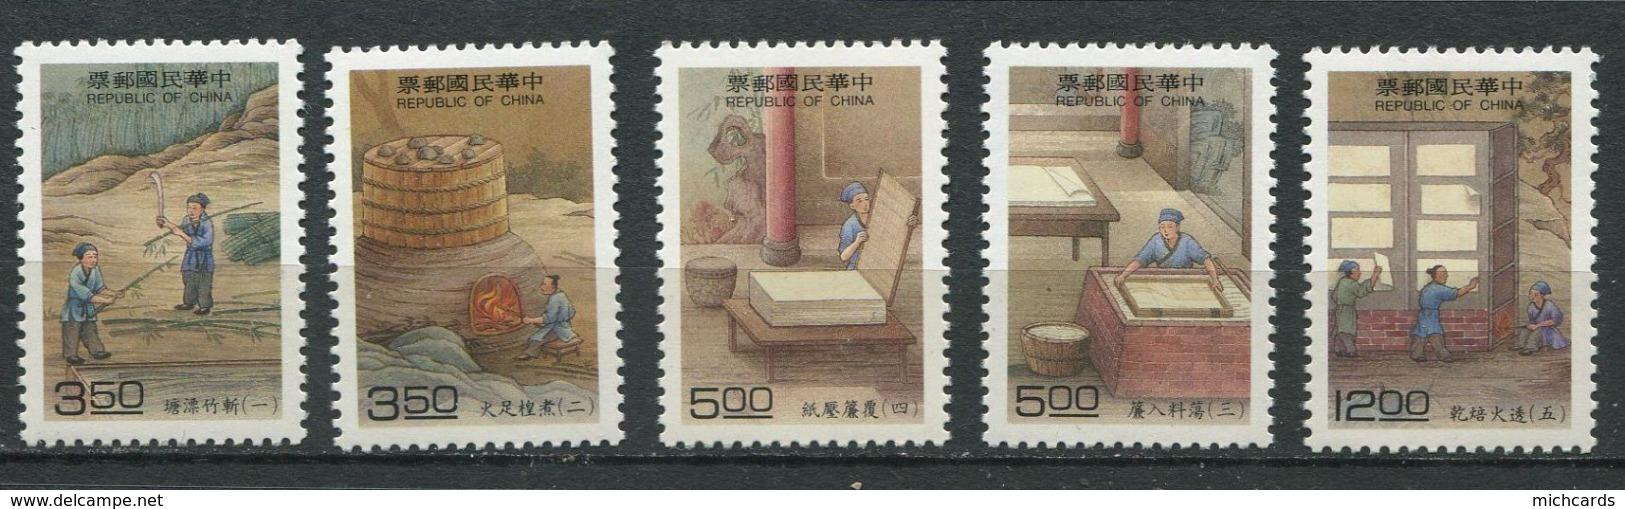 254 FORMOSE 1994 - Yvert 2095/99 - Fabrication Du Papier Bambou - Neuf ** (MNH) Sans Trace De Charniere - 1945-... Republik China